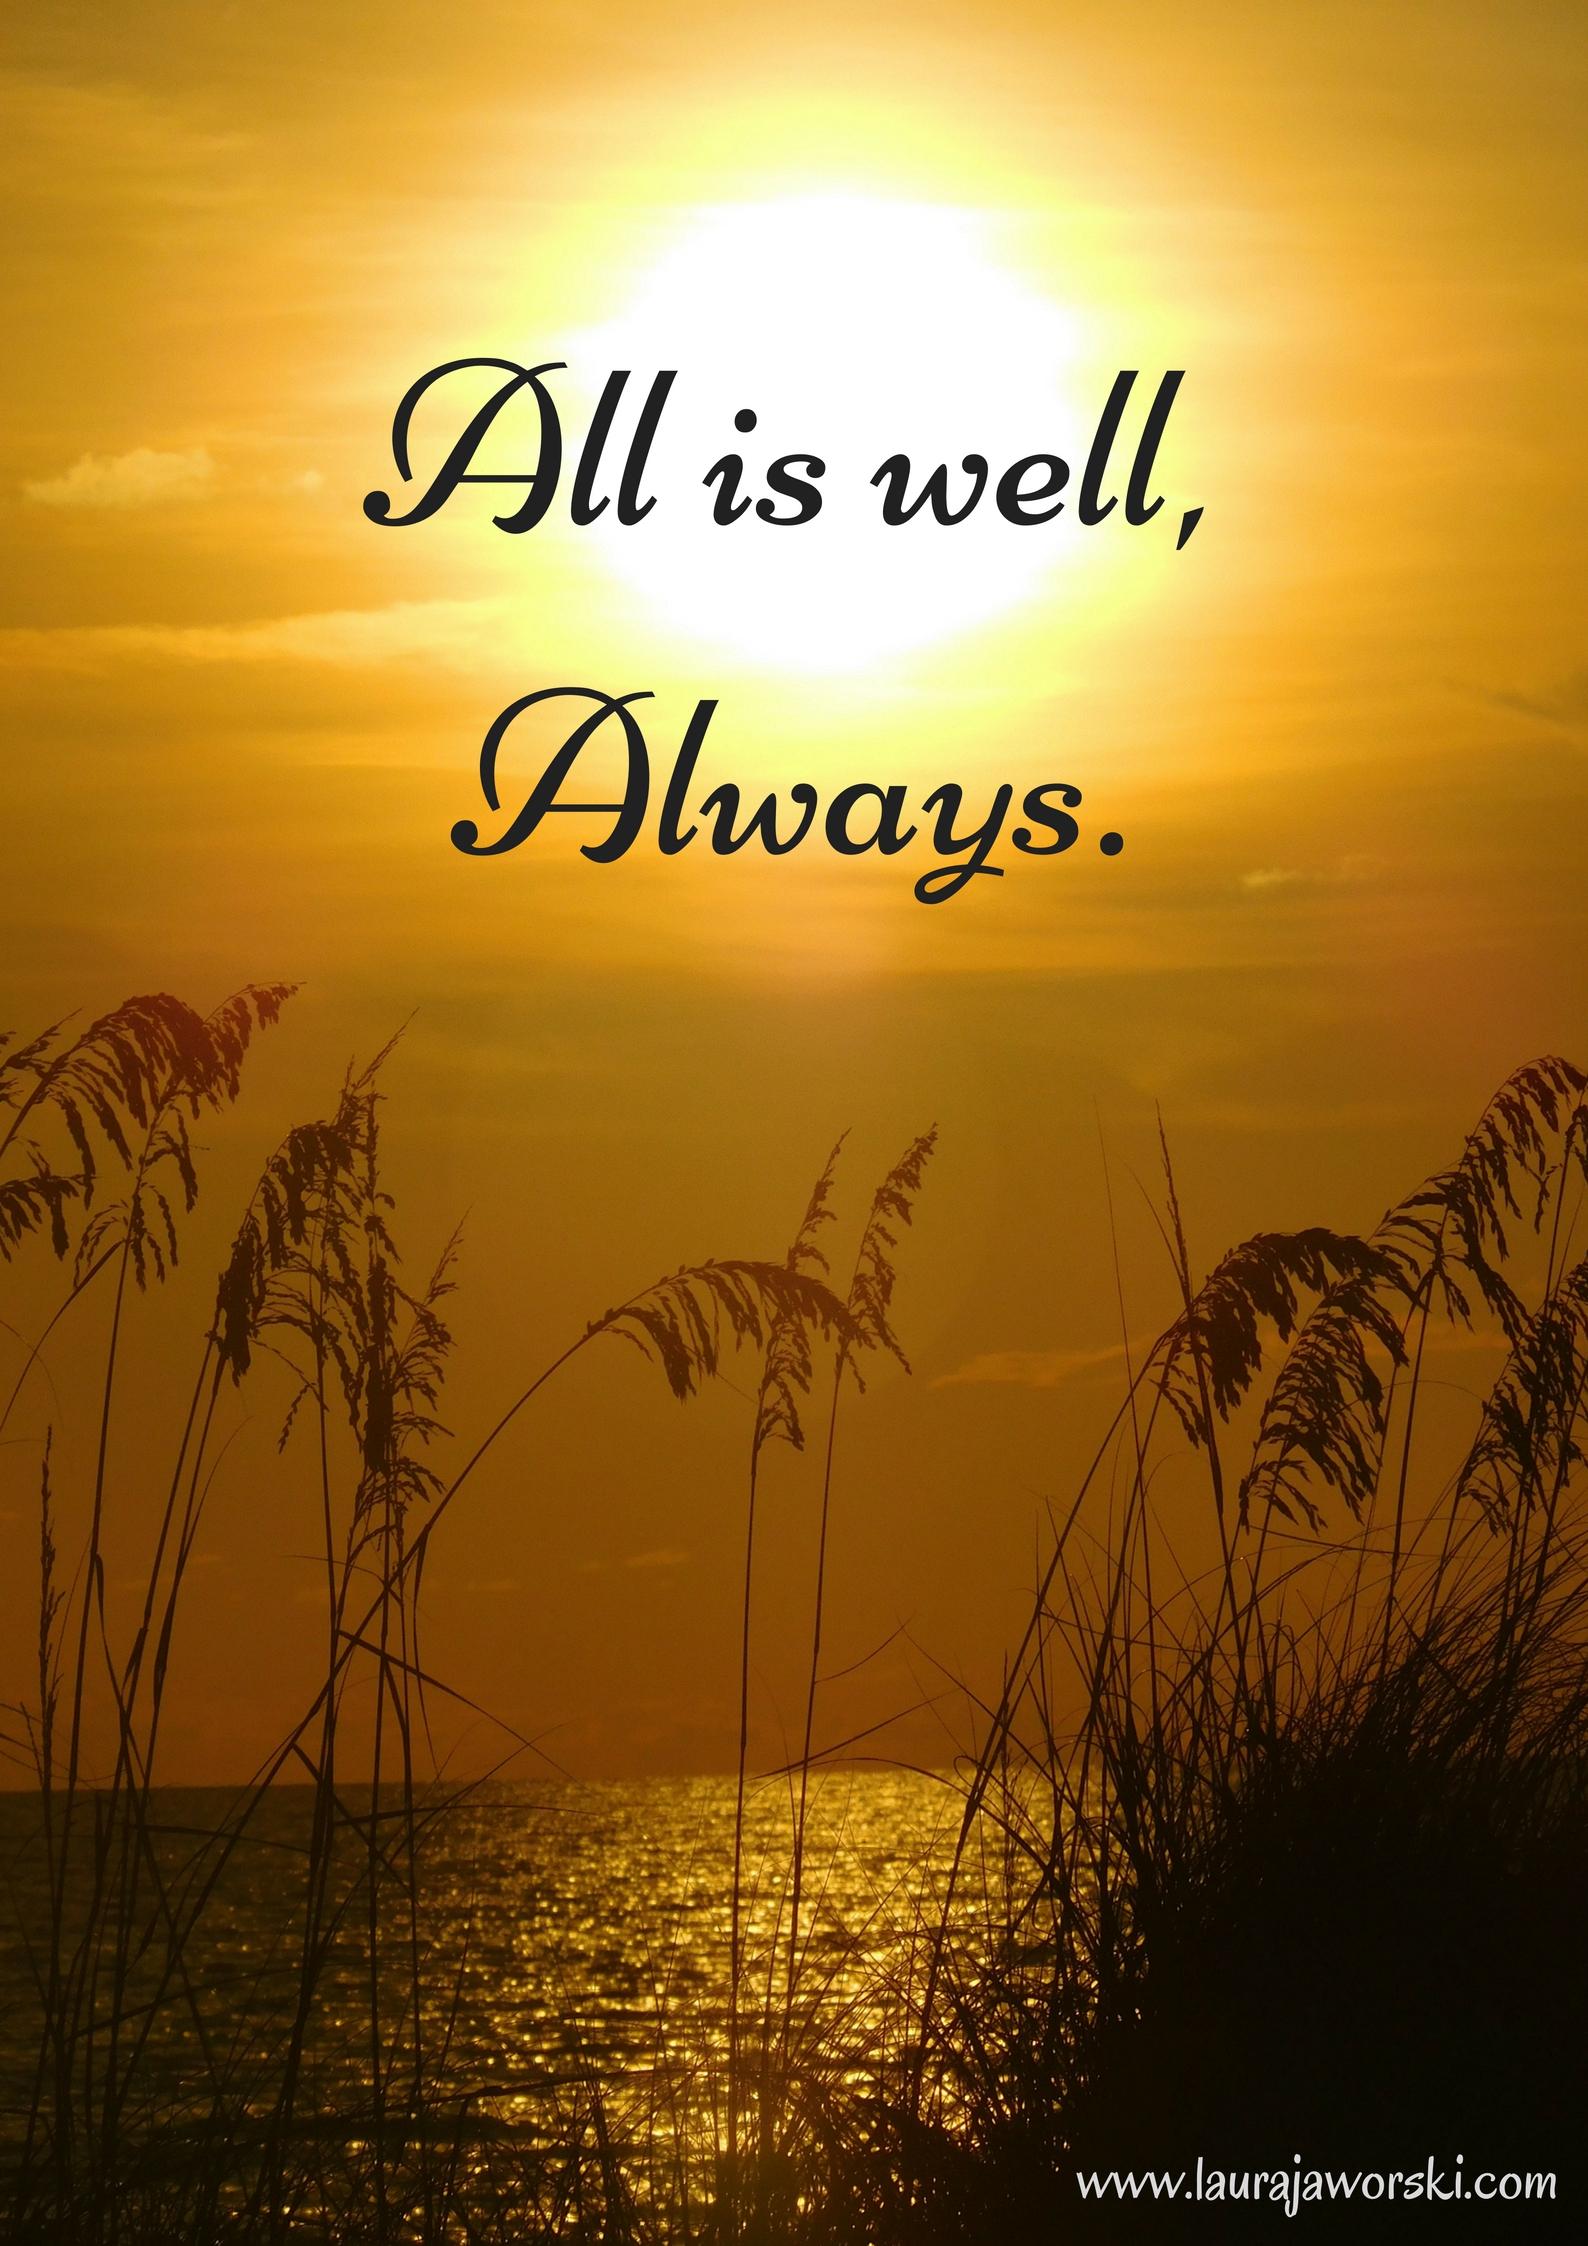 All Is Well | www.laurajaworski.com